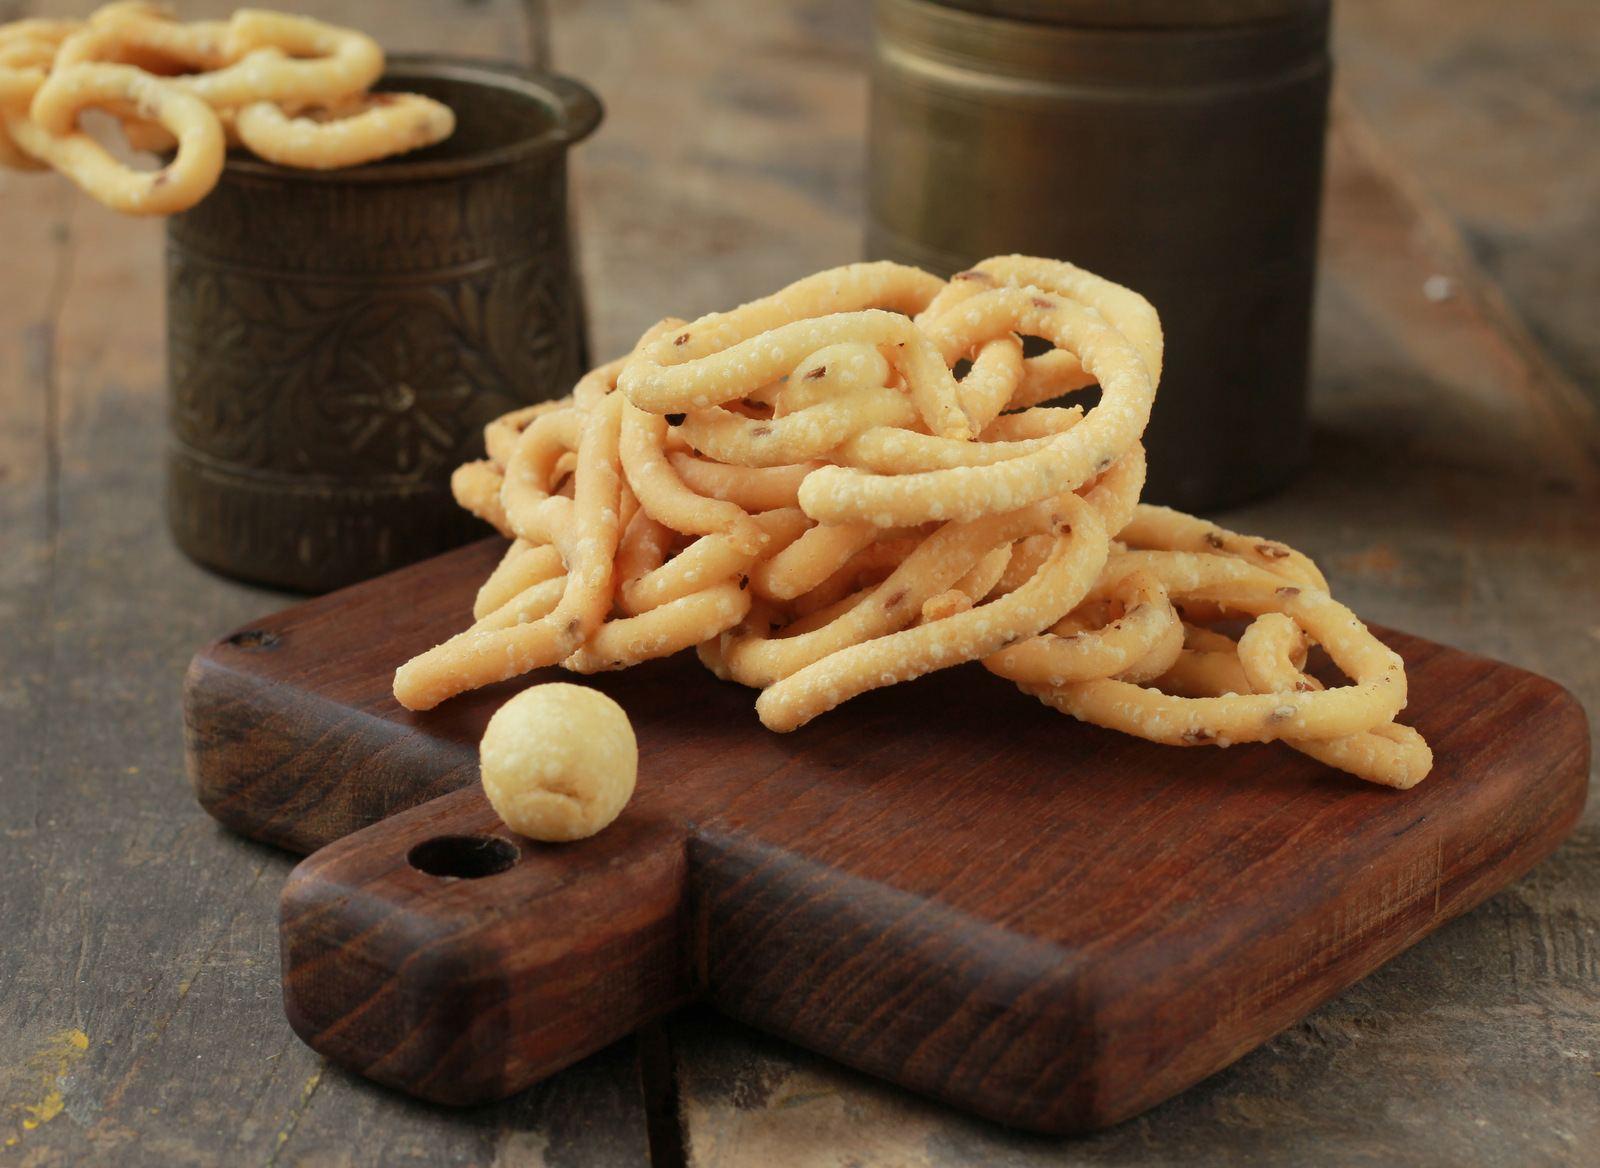 Thenkuzal Recipe (South Indian Snack Using Rice Flour Urad Dal Flour)